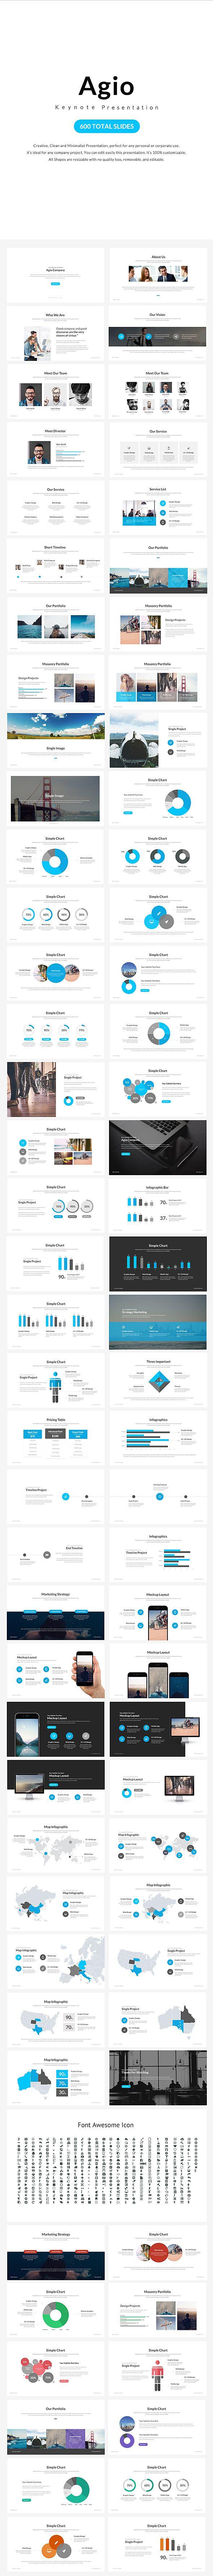 Agio Keynote Presentation - Business Keynote Templates Download here : https://graphicriver.net/item/agio-keynote-presentation/19456725?s_rank=375&ref=Al-fatih #keynote #keynote template #keynote slides #design #premium design #design of keynote #keynote presentation #envato #envato market #graphicriver